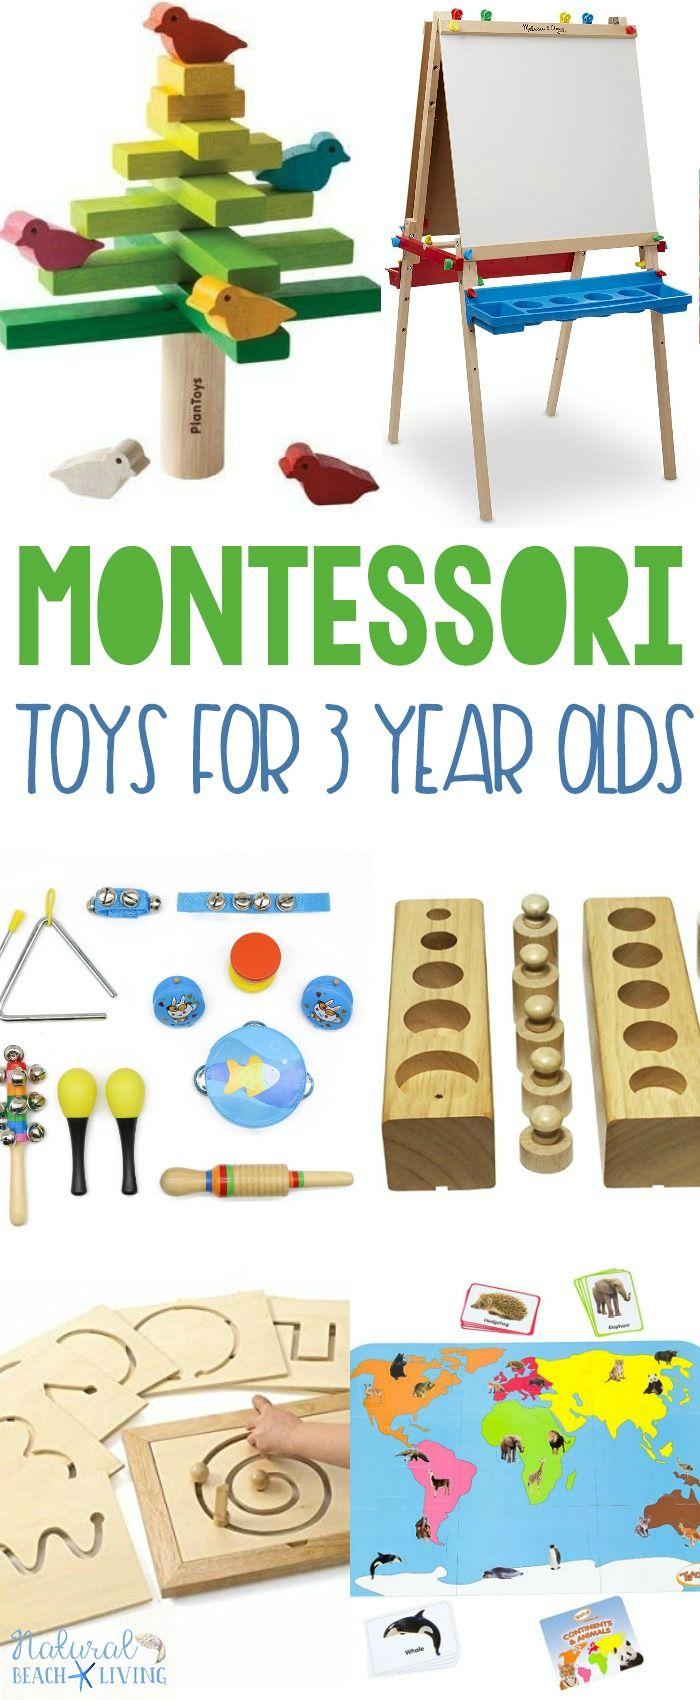 Montessori Gifts 3 Year Olds Love Montessori Toys